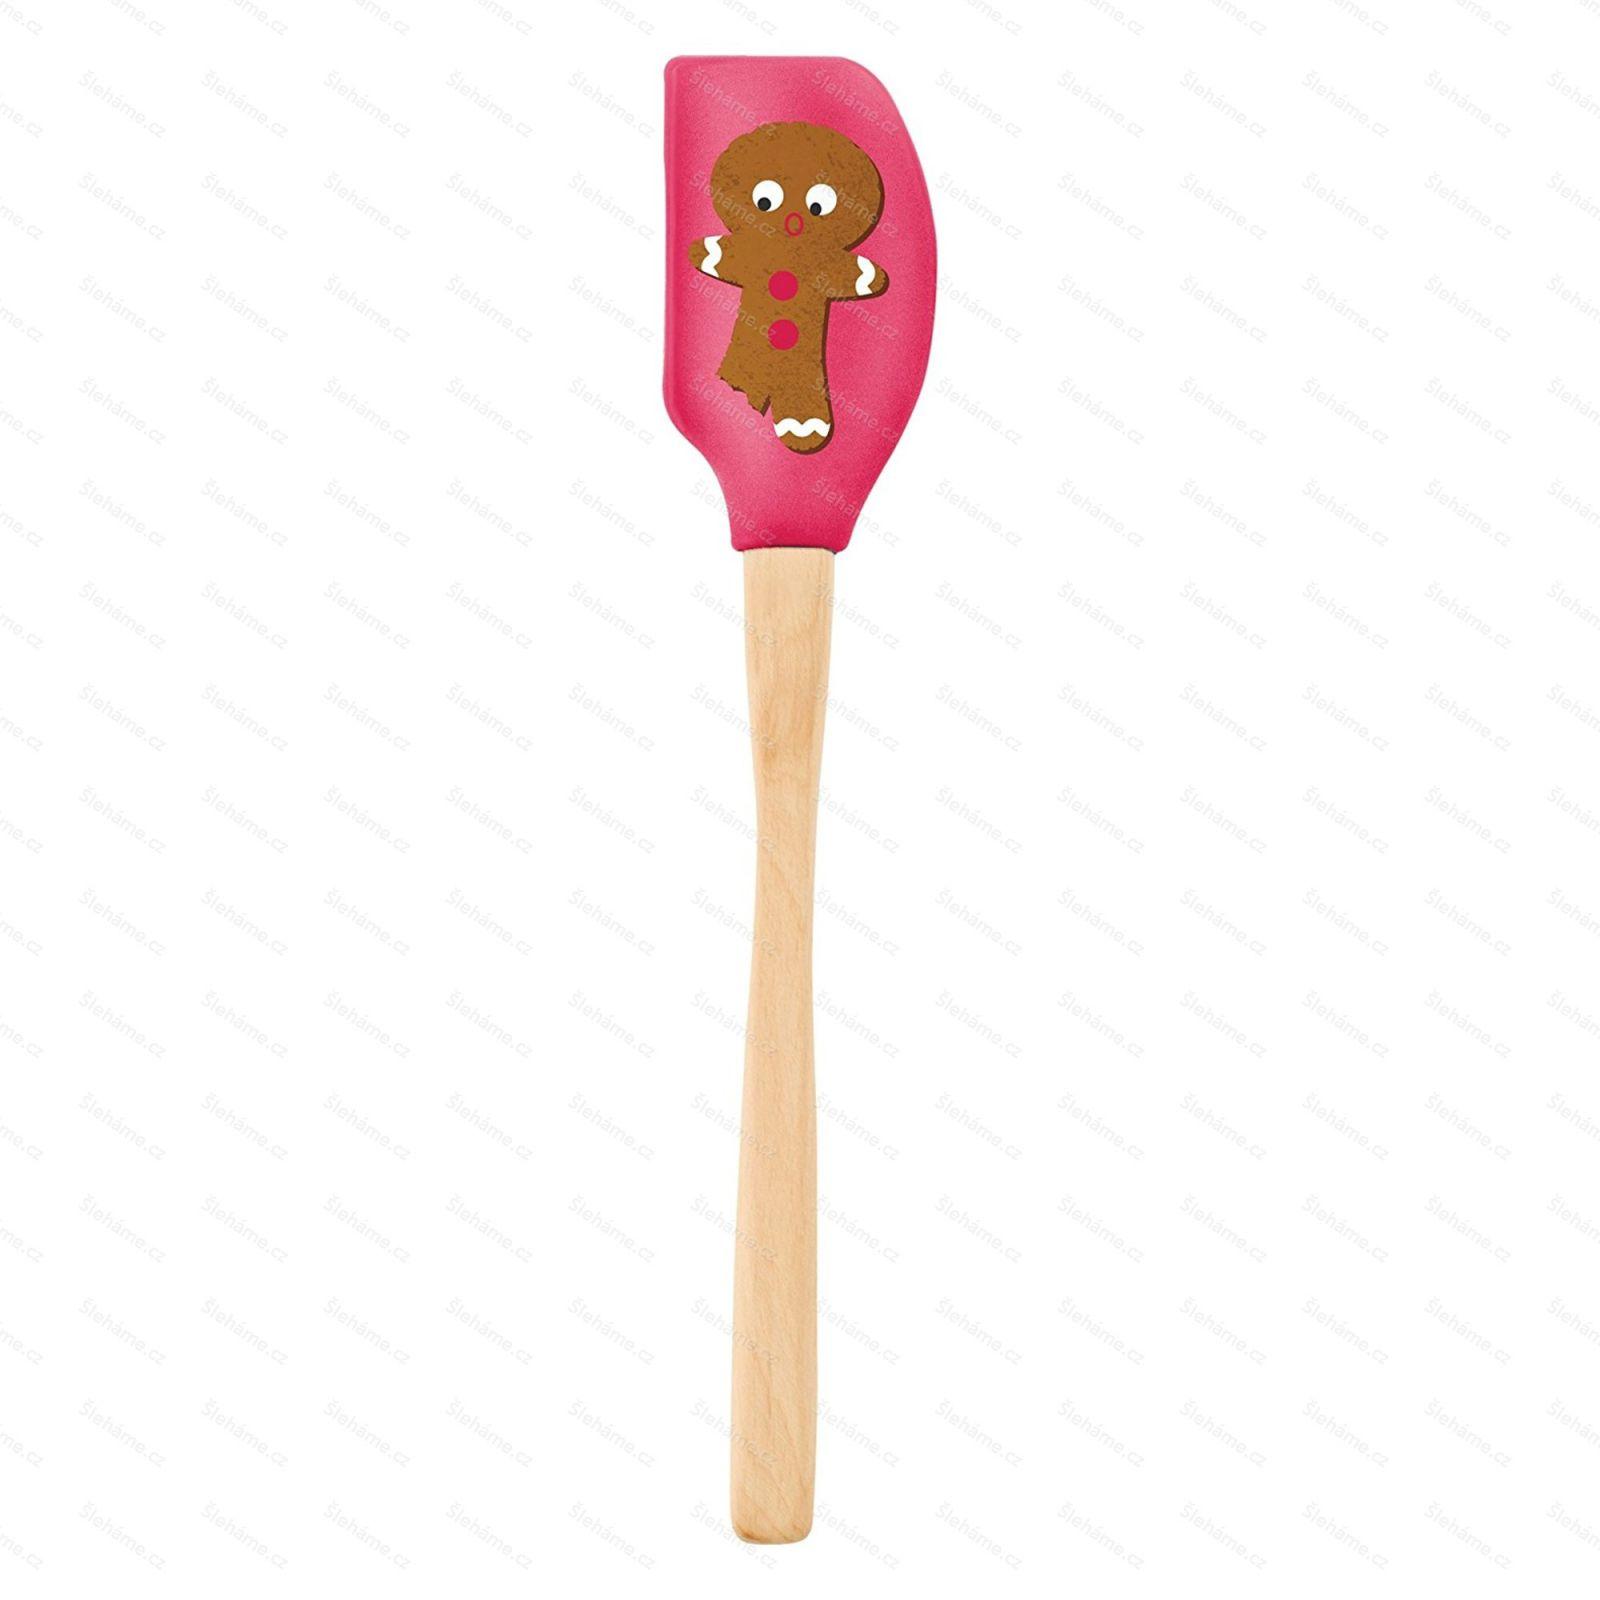 Stěrka Tovolo SPATULART Gingerbread Cookie